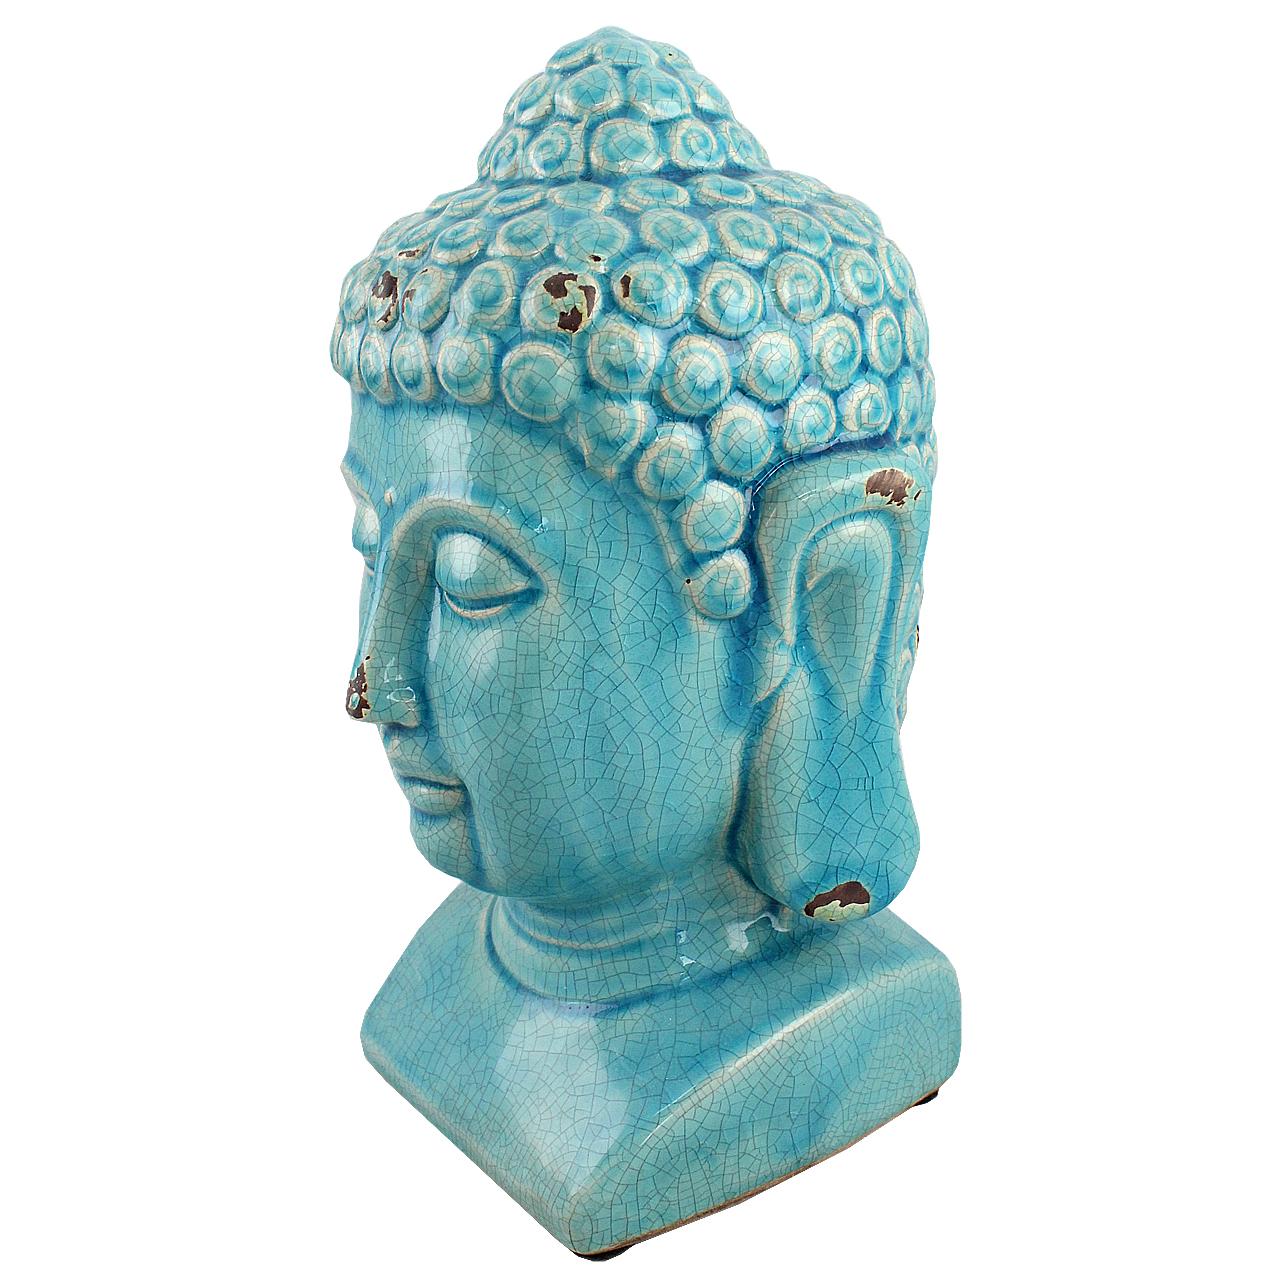 Statueta Cap De Buddha Din Ceramica Turcoaz 24 Cm